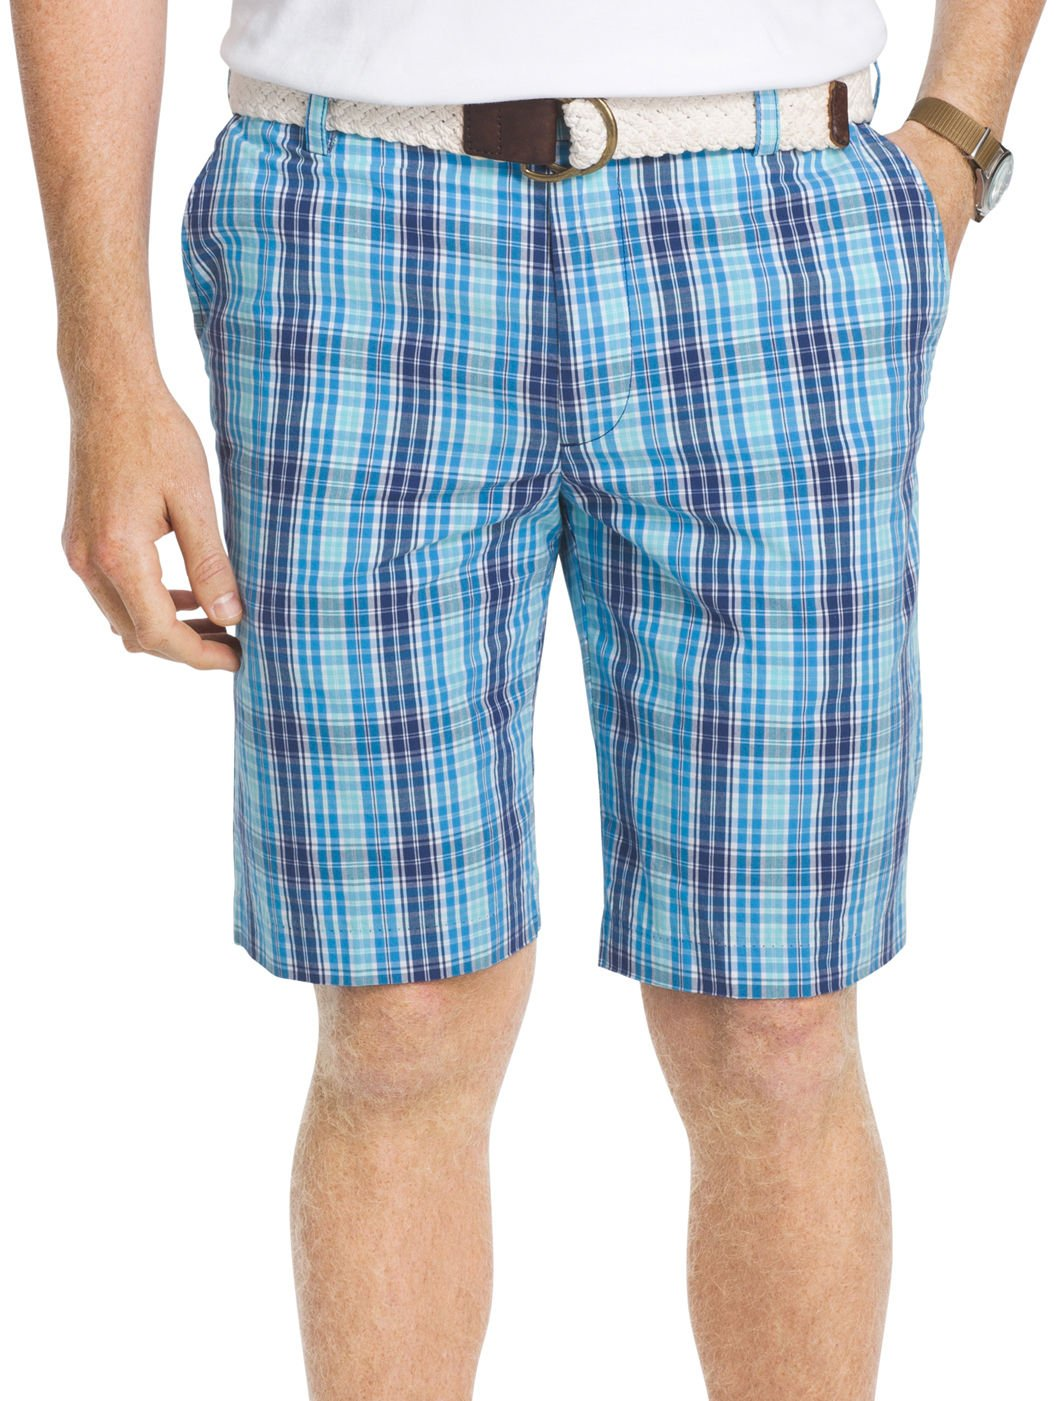 Izod Men's Flat Front Yard Colored Large Plaid Shorts 82SH222